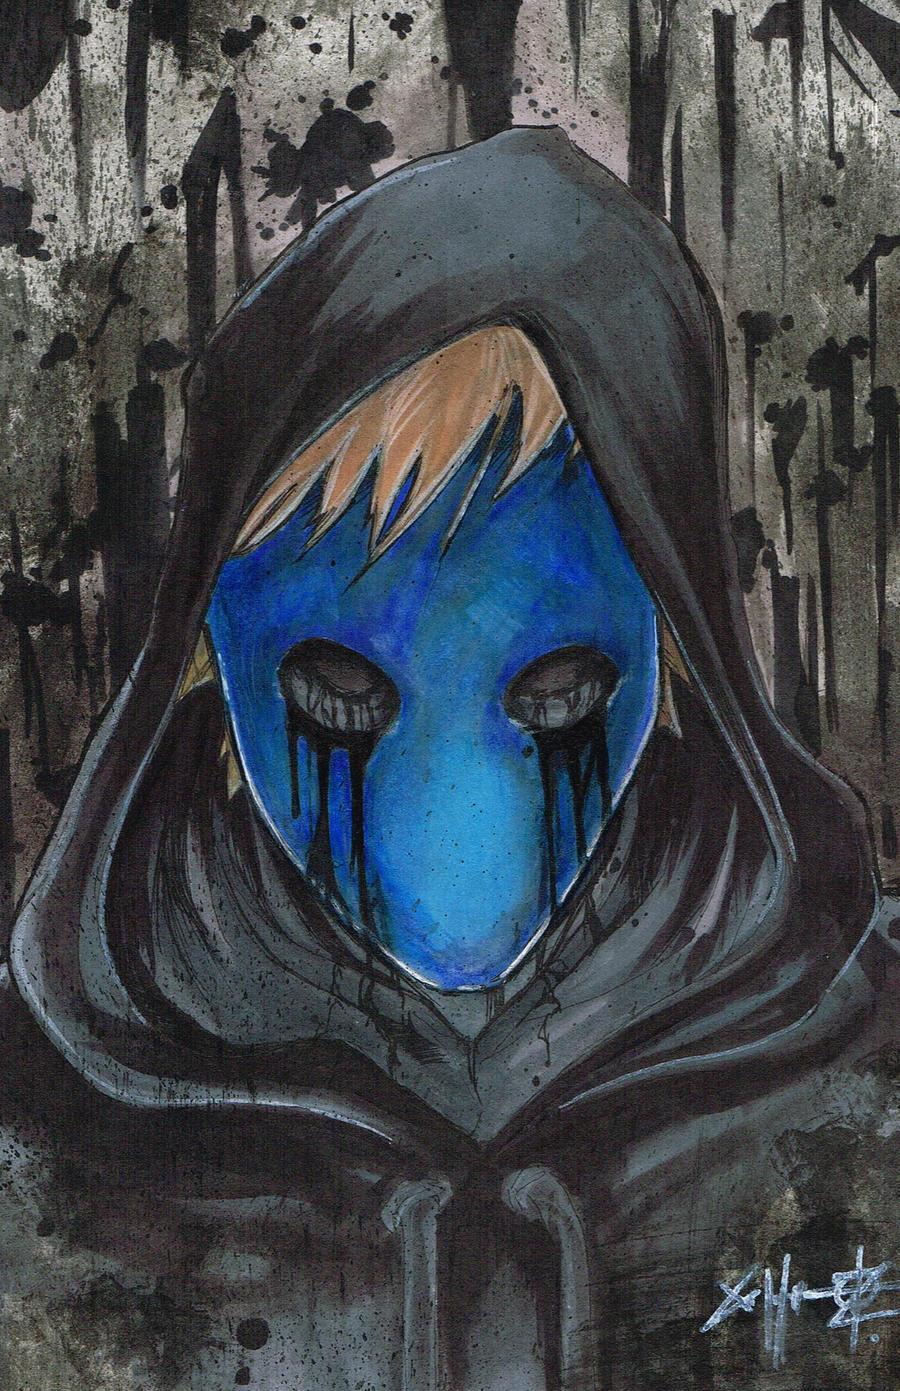 Eyeless Jack CreepyPasta By ChrisOzFulton On DeviantArt